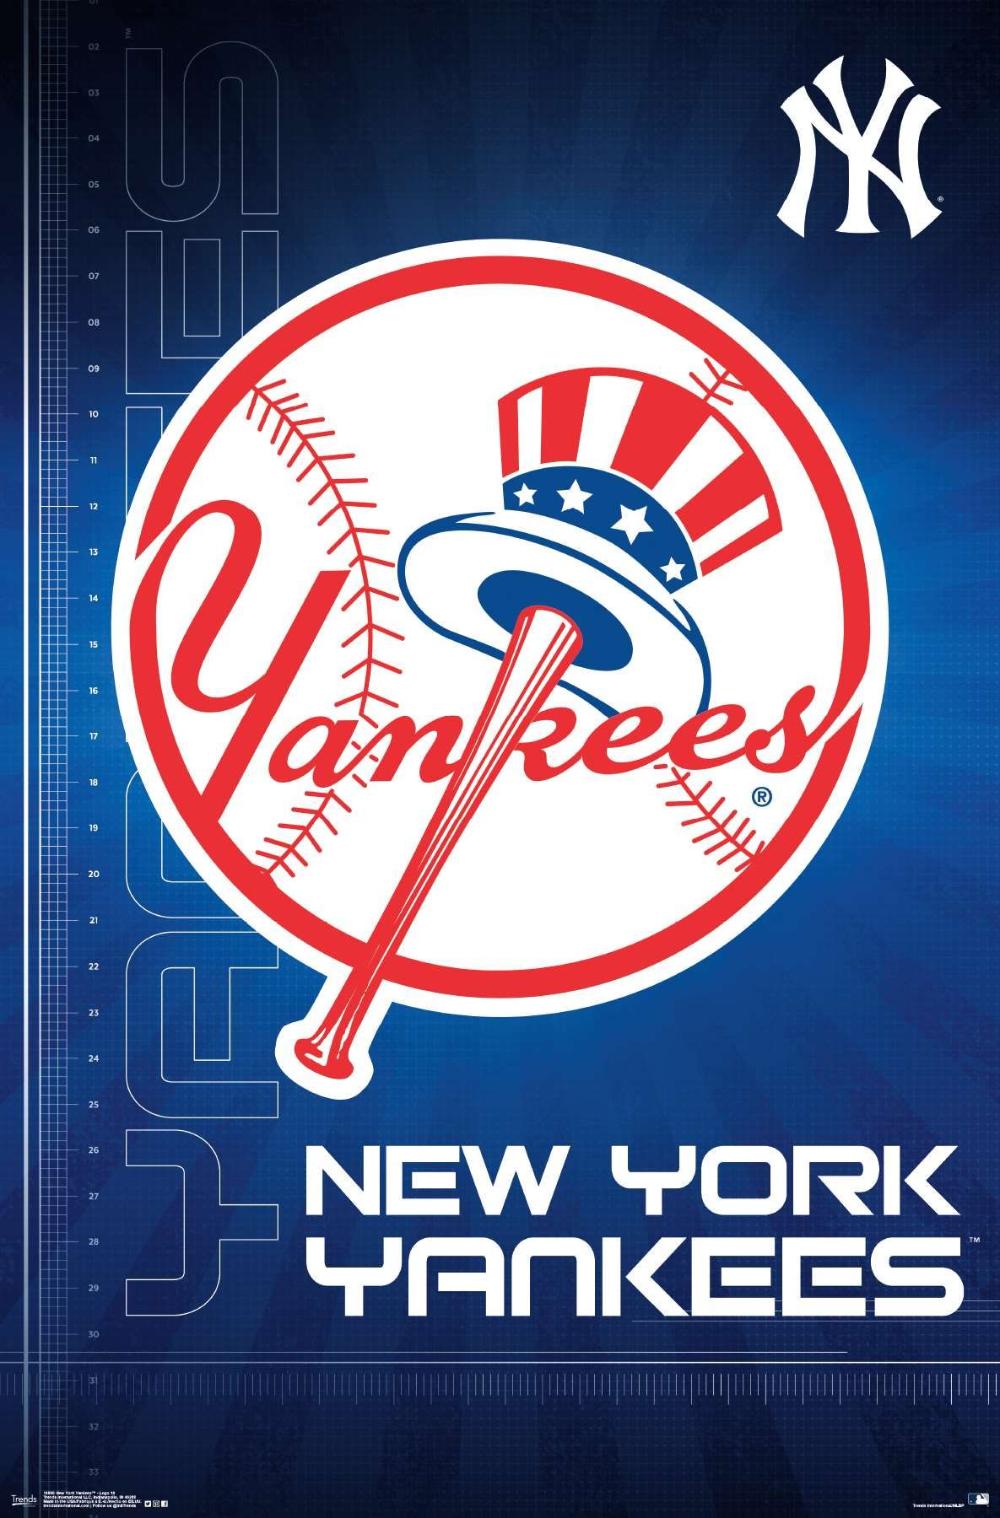 Mlb New York Yankees Logo In 2020 New York Yankees Logo Yankees Logo New York Yankees